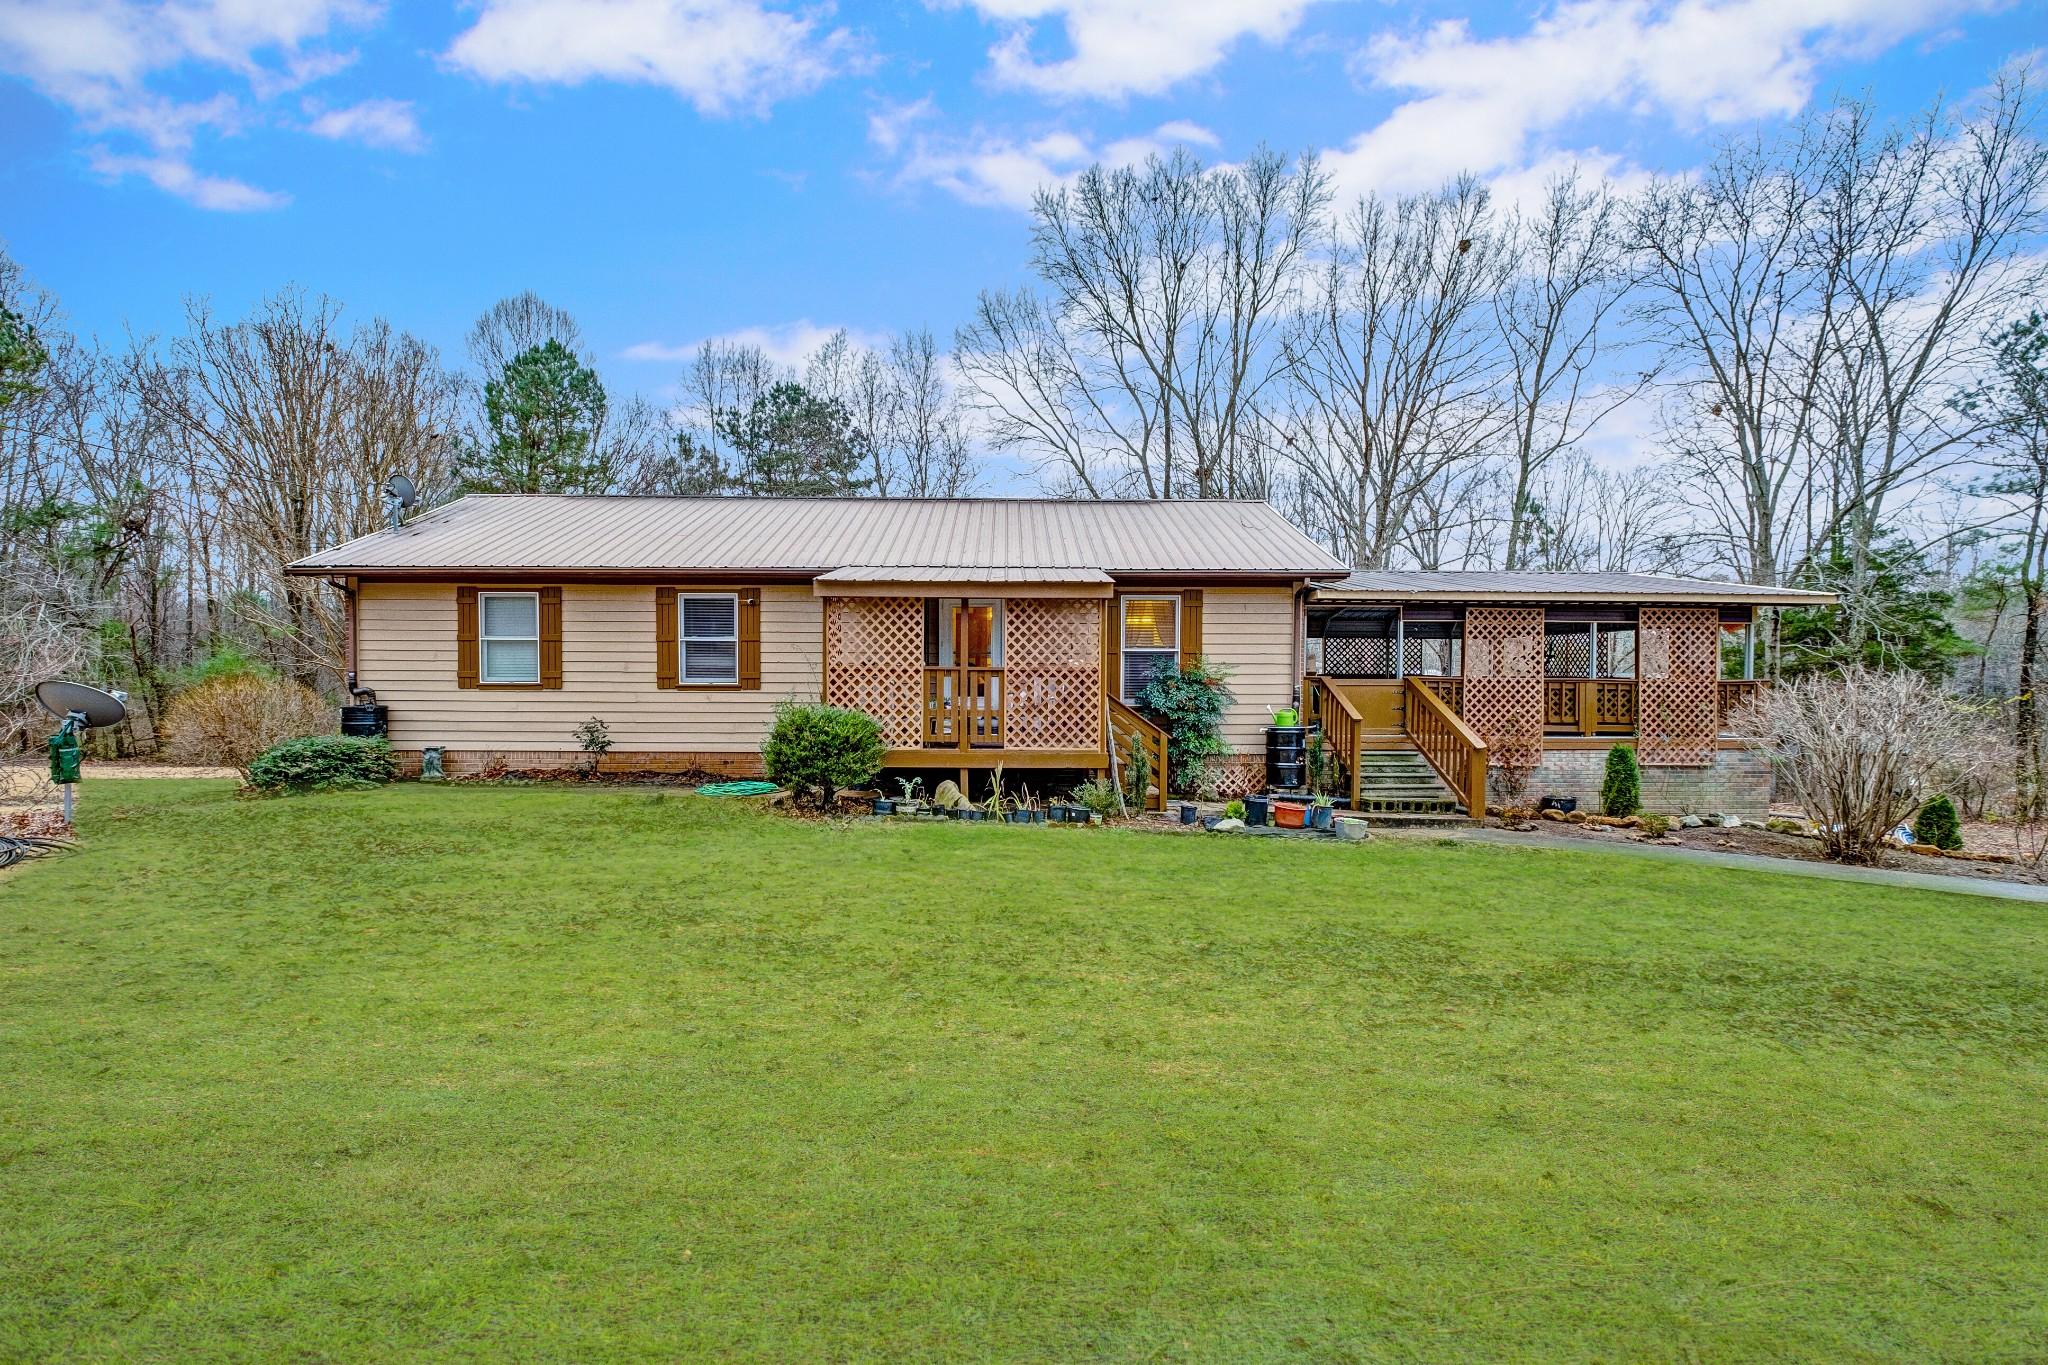 9079 E Oak Dr Property Photo - Bon Aqua, TN real estate listing